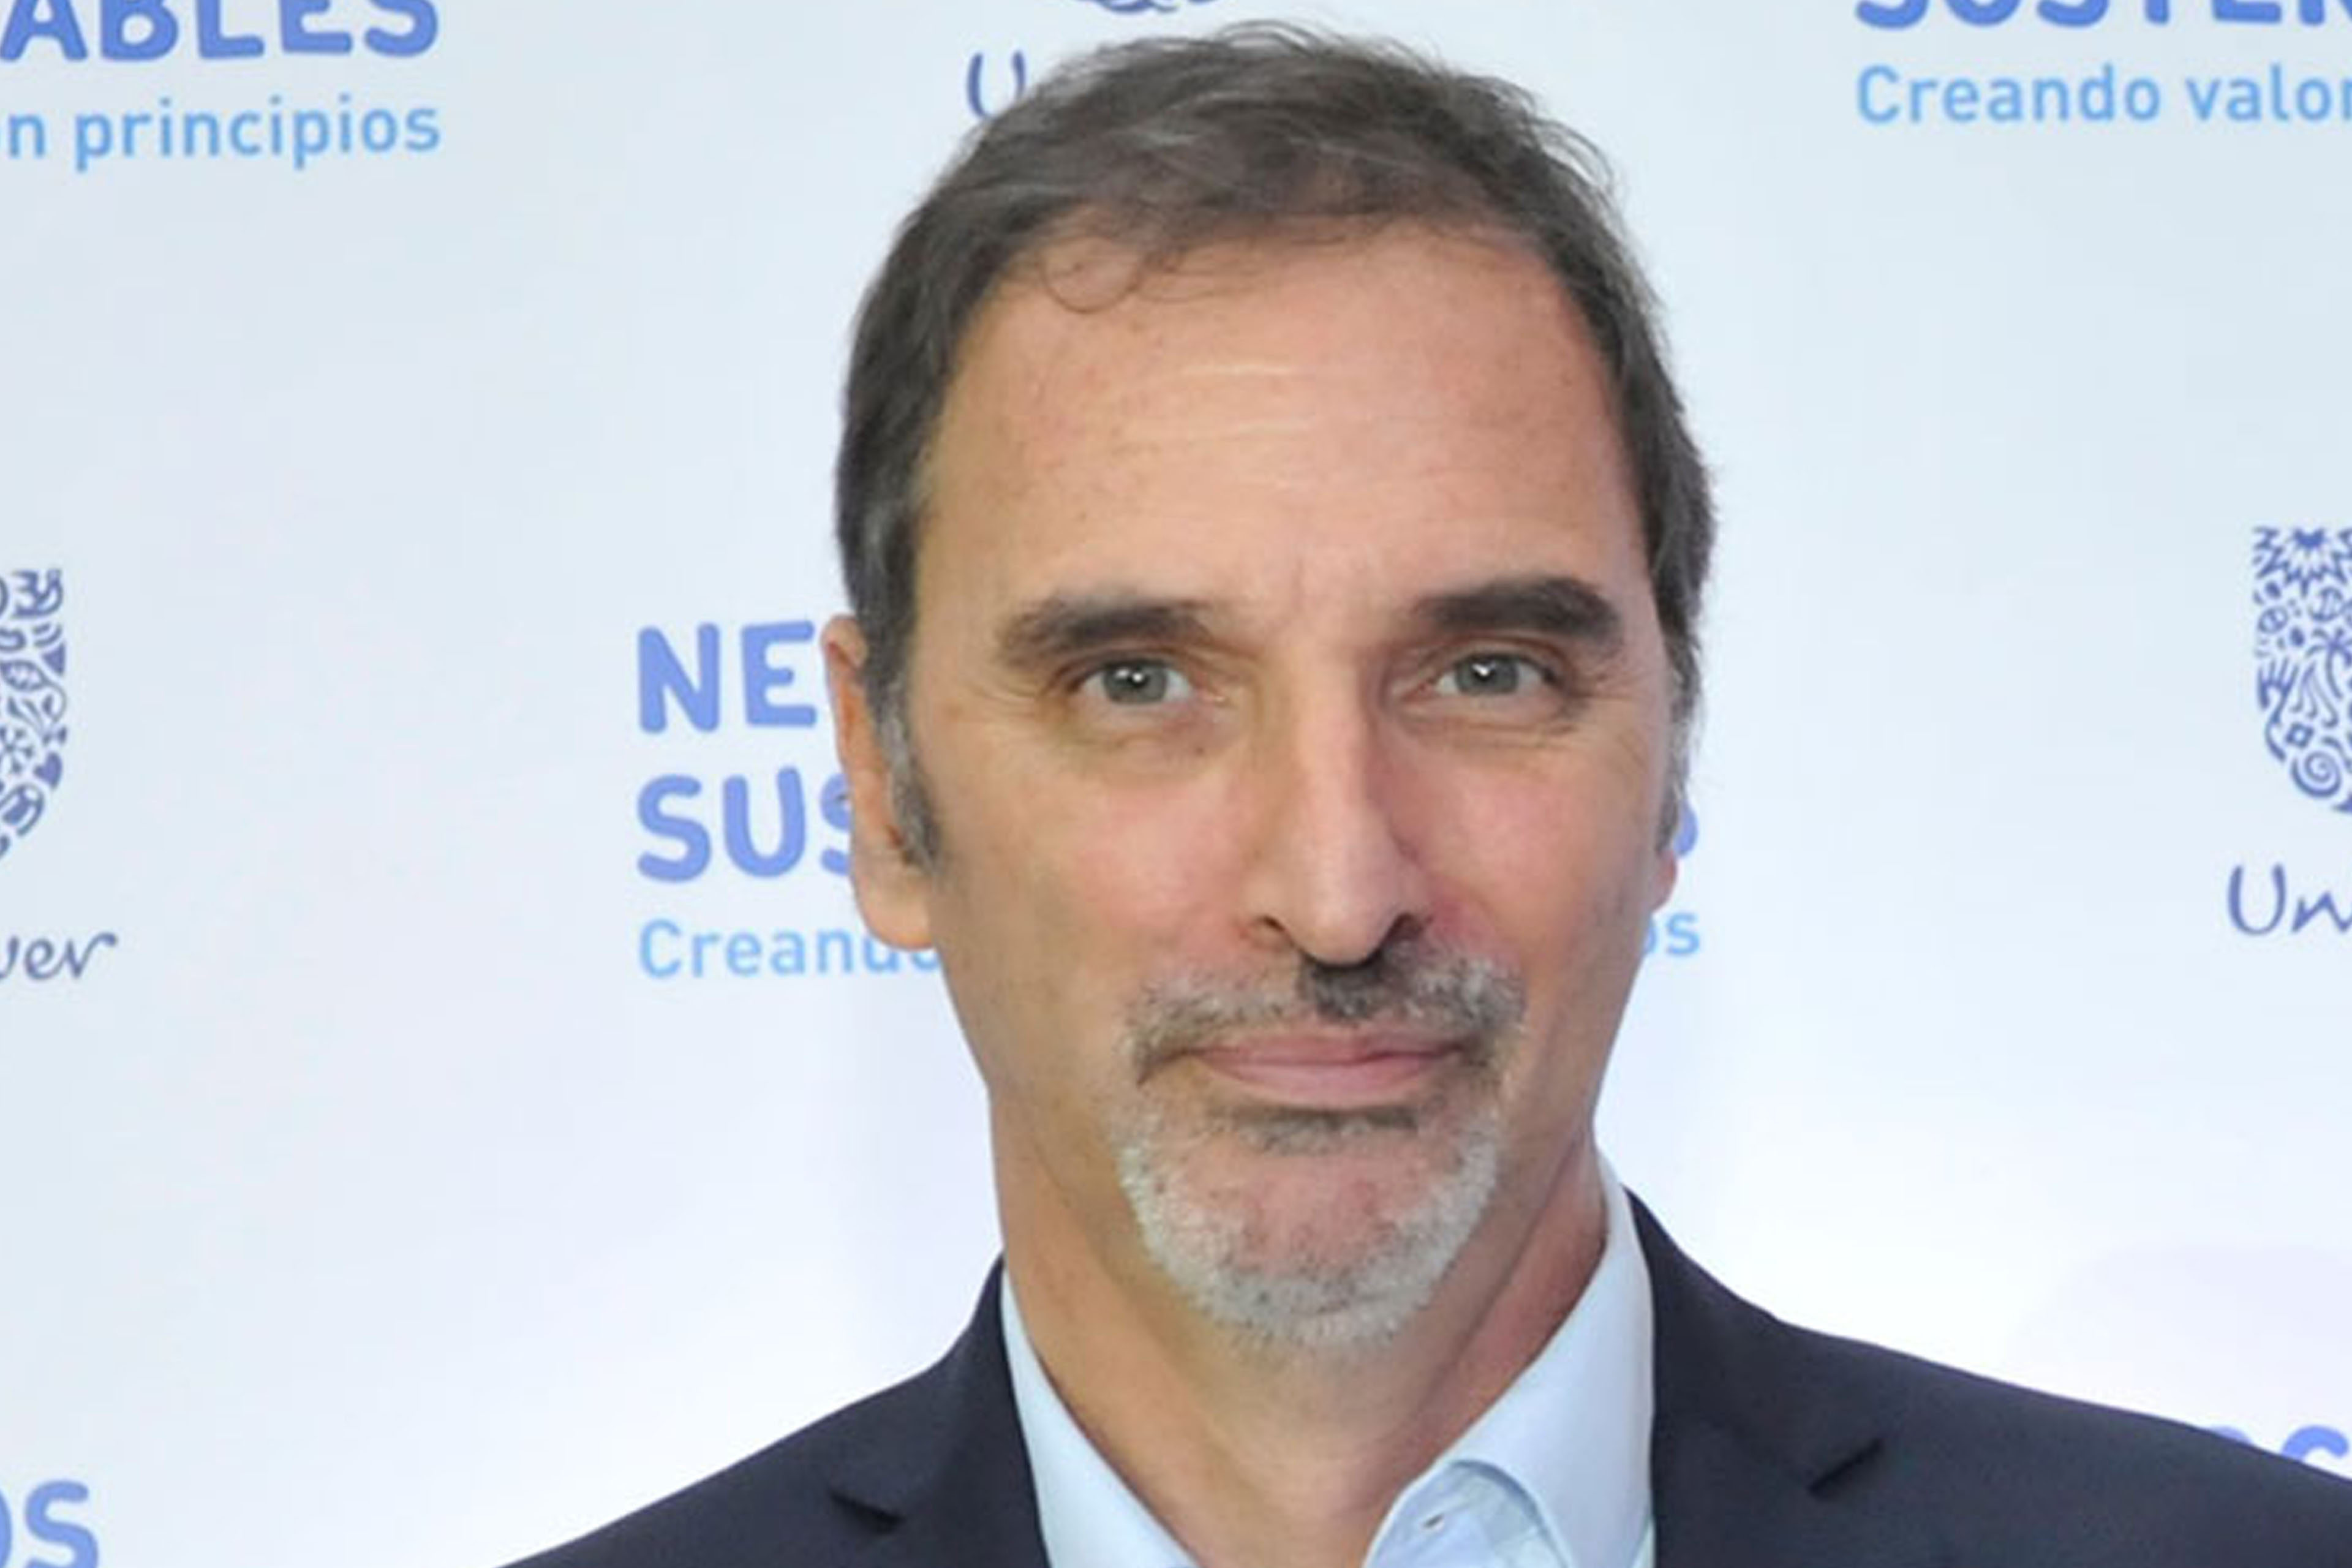 Miguel Kozuszok